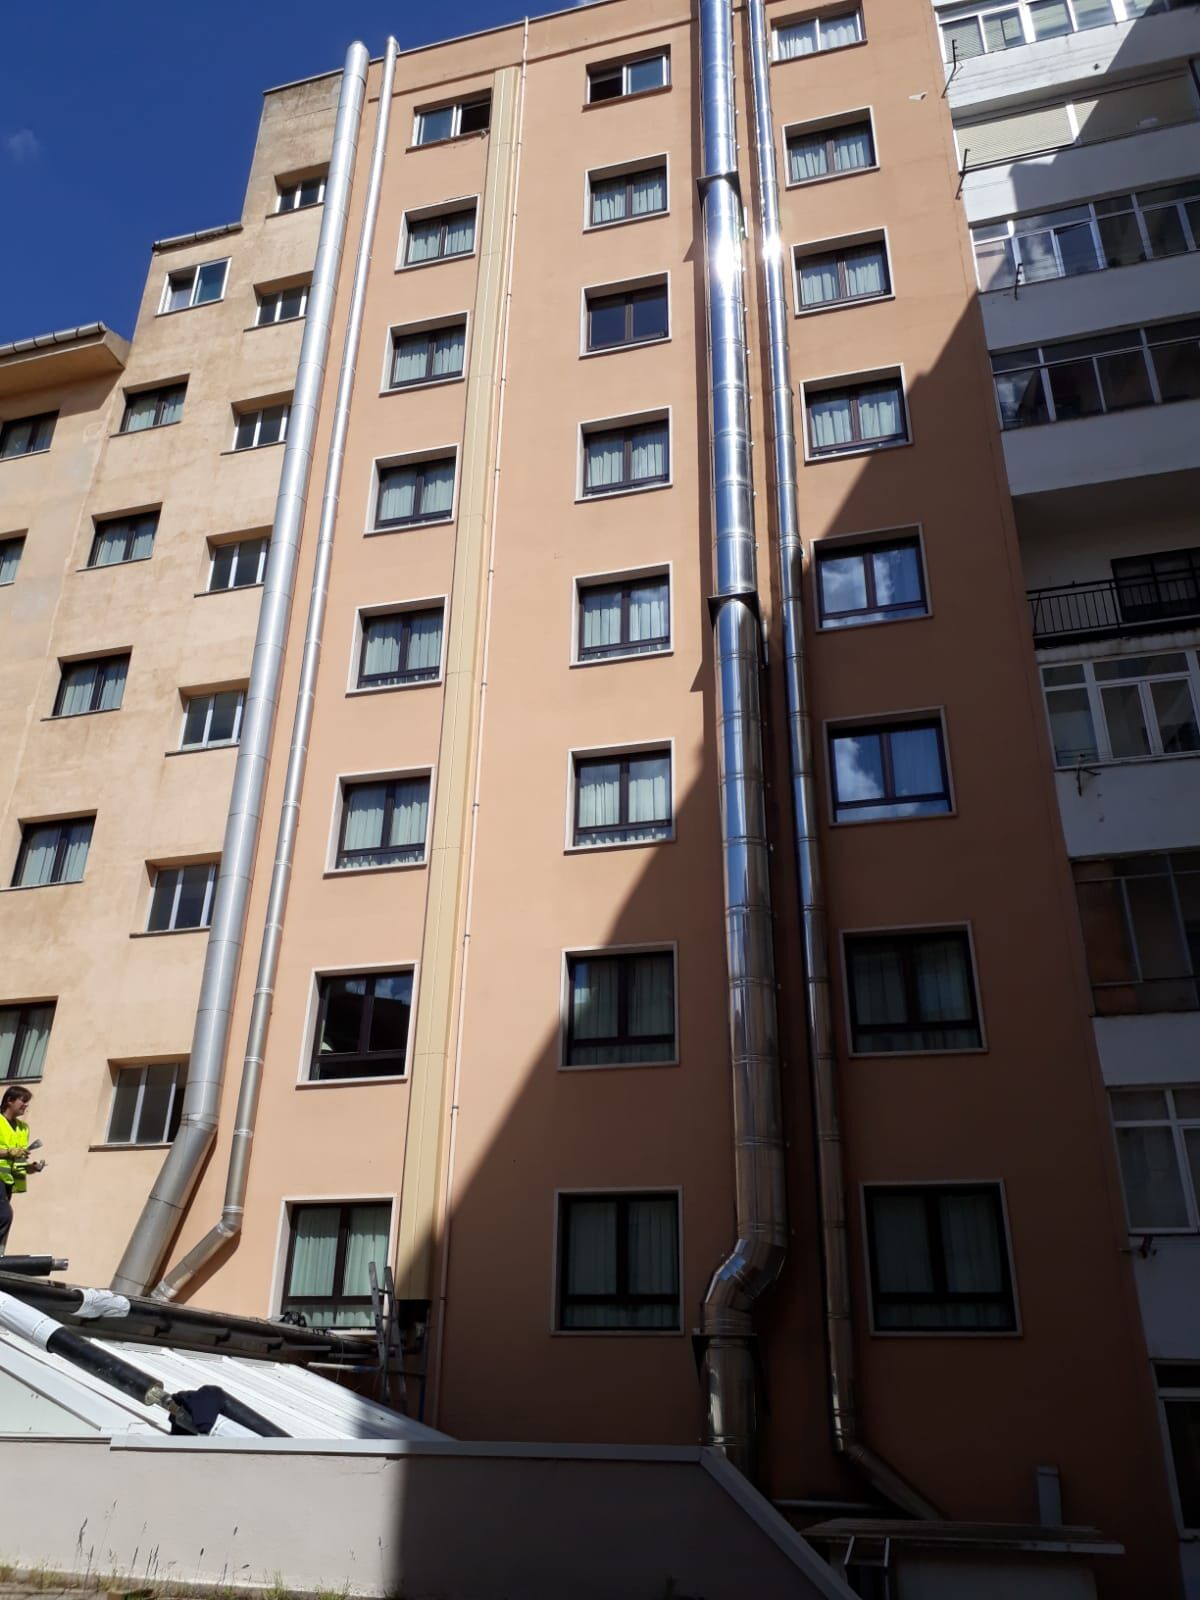 El equipo de Rebi conecta el Hotel Alfonso VIII de Soria